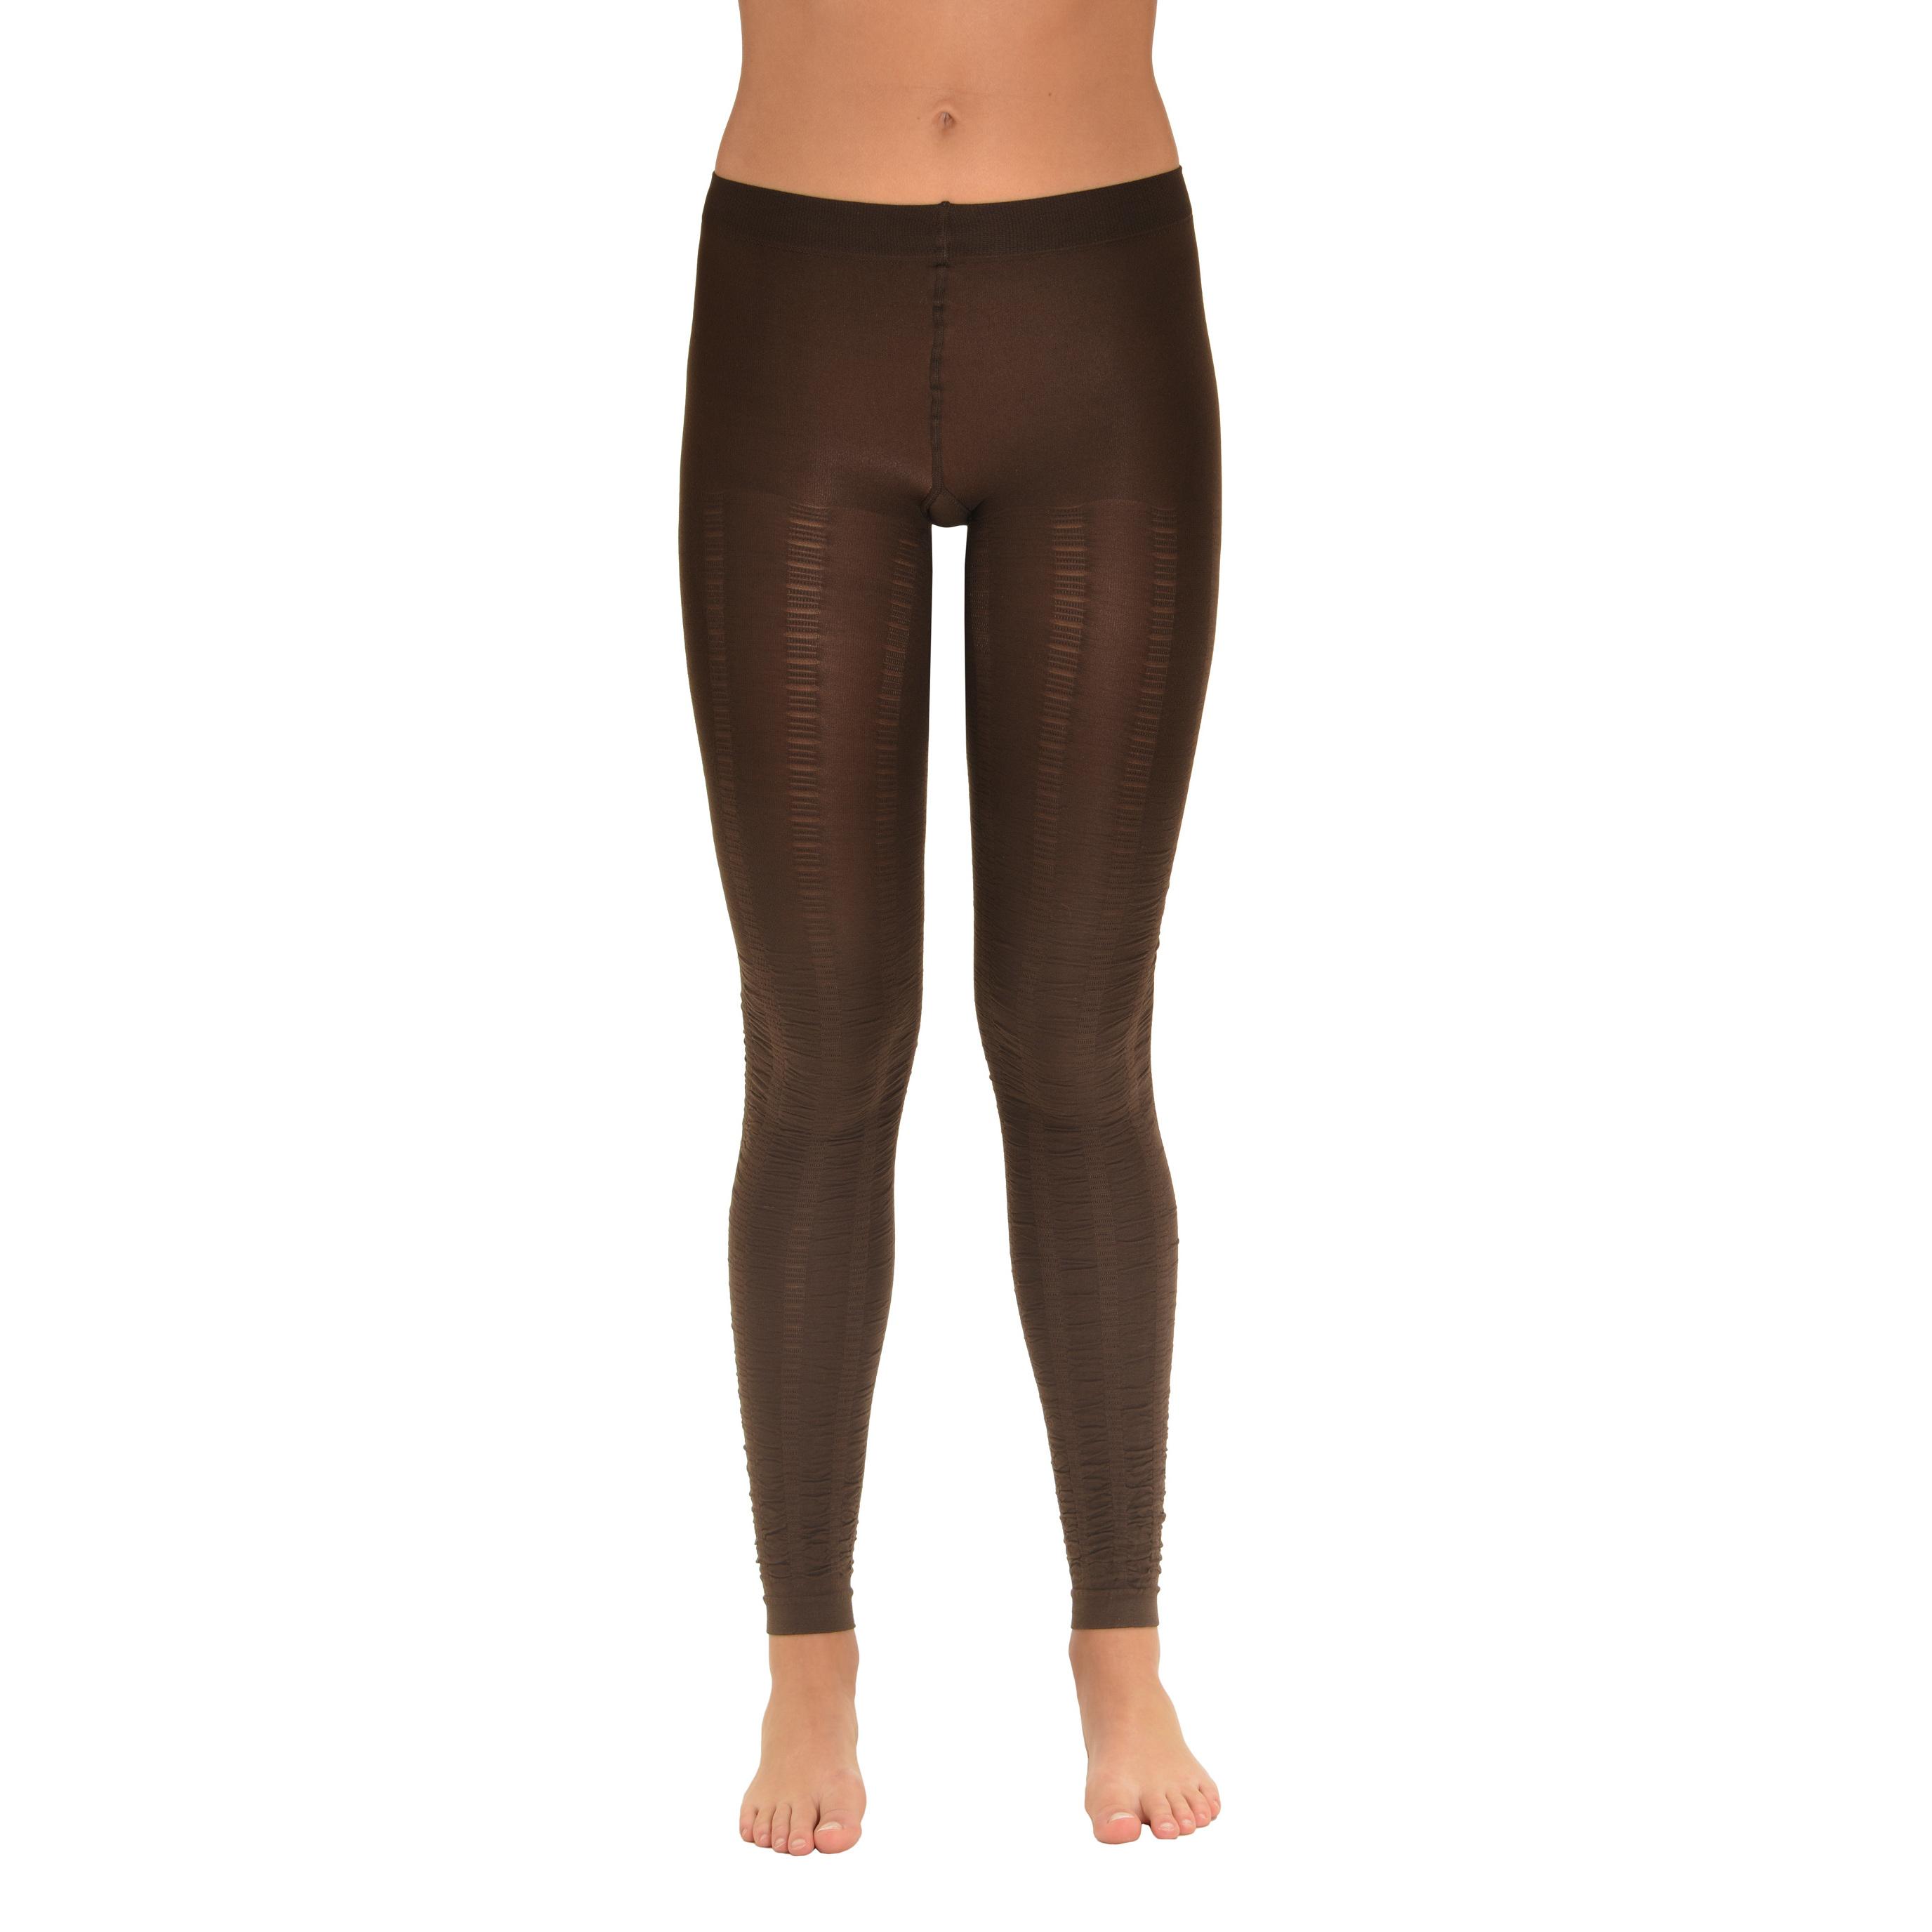 womens footless tights ruching burgundy gray or brown leggings made in  italy - walmart.com eereltz